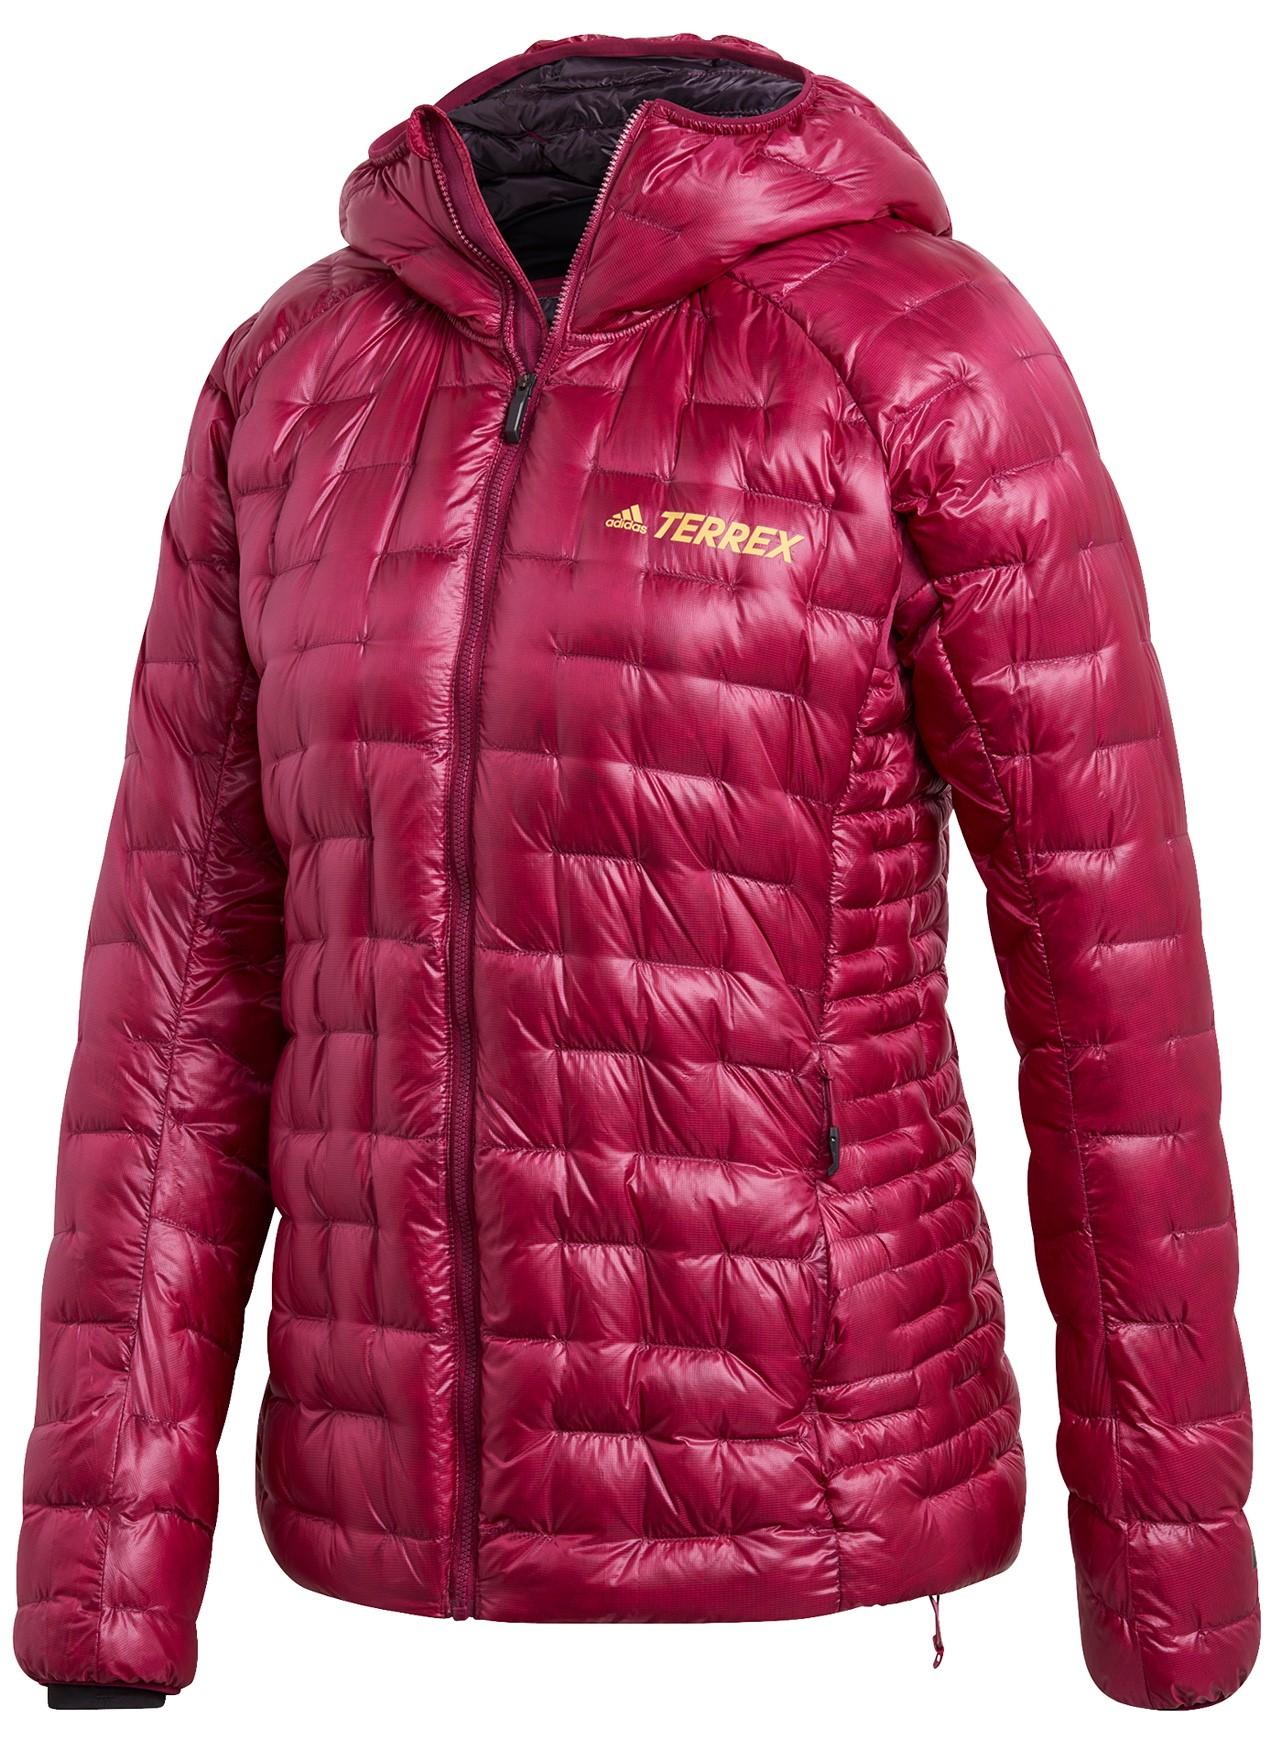 adidas Frauen TERREX Icesky Hooded Daunenjacke - power berry FT6089